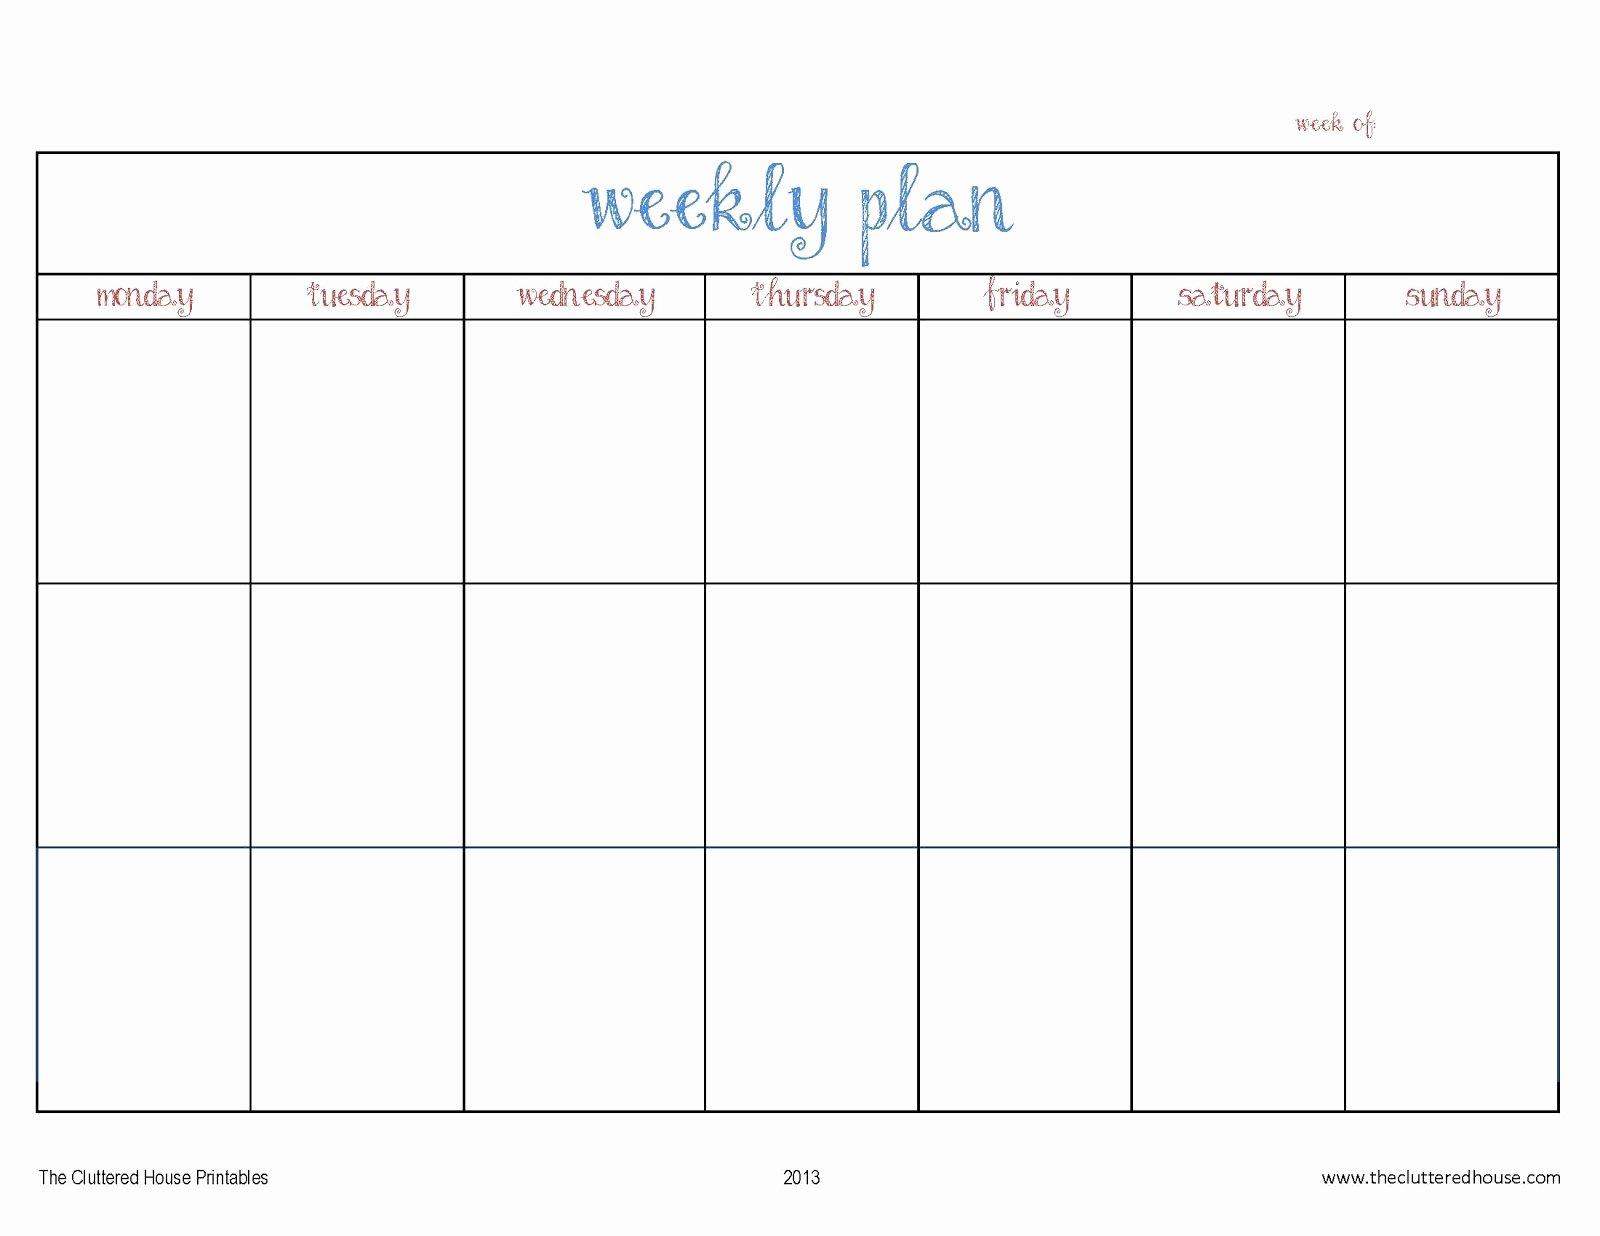 7 Day Week Schedule Template New Blank 7 Days Work Schedule Template